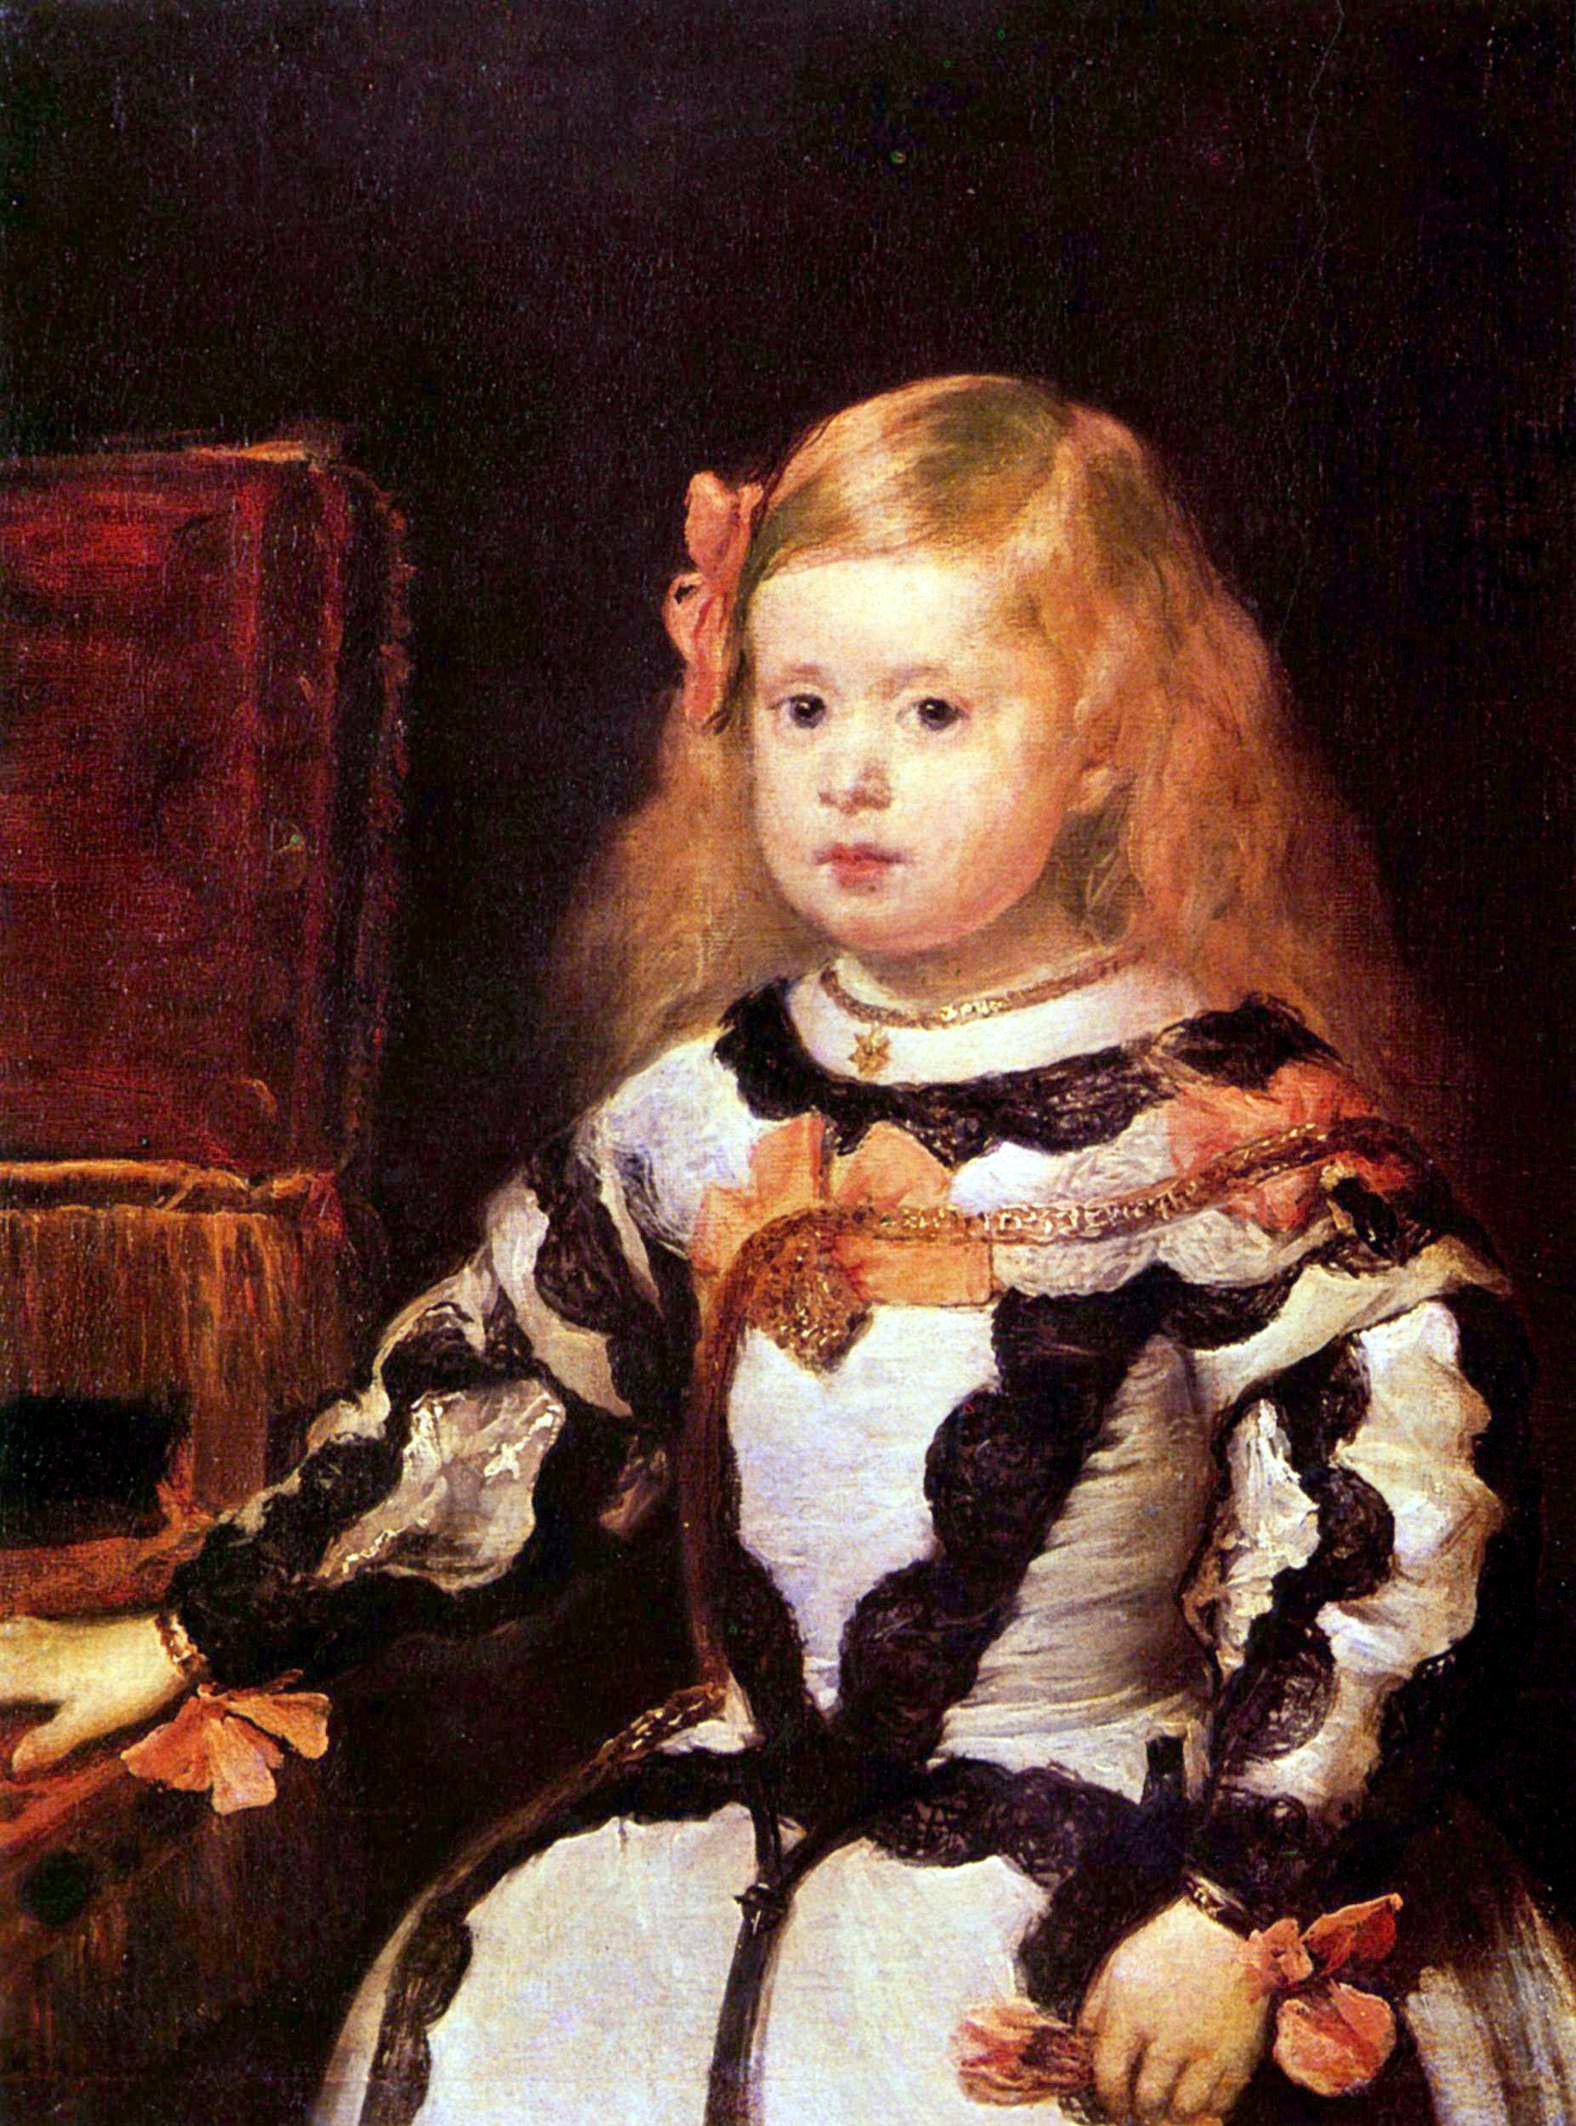 Margarita Teresa of Spain, Holy Roman Empress